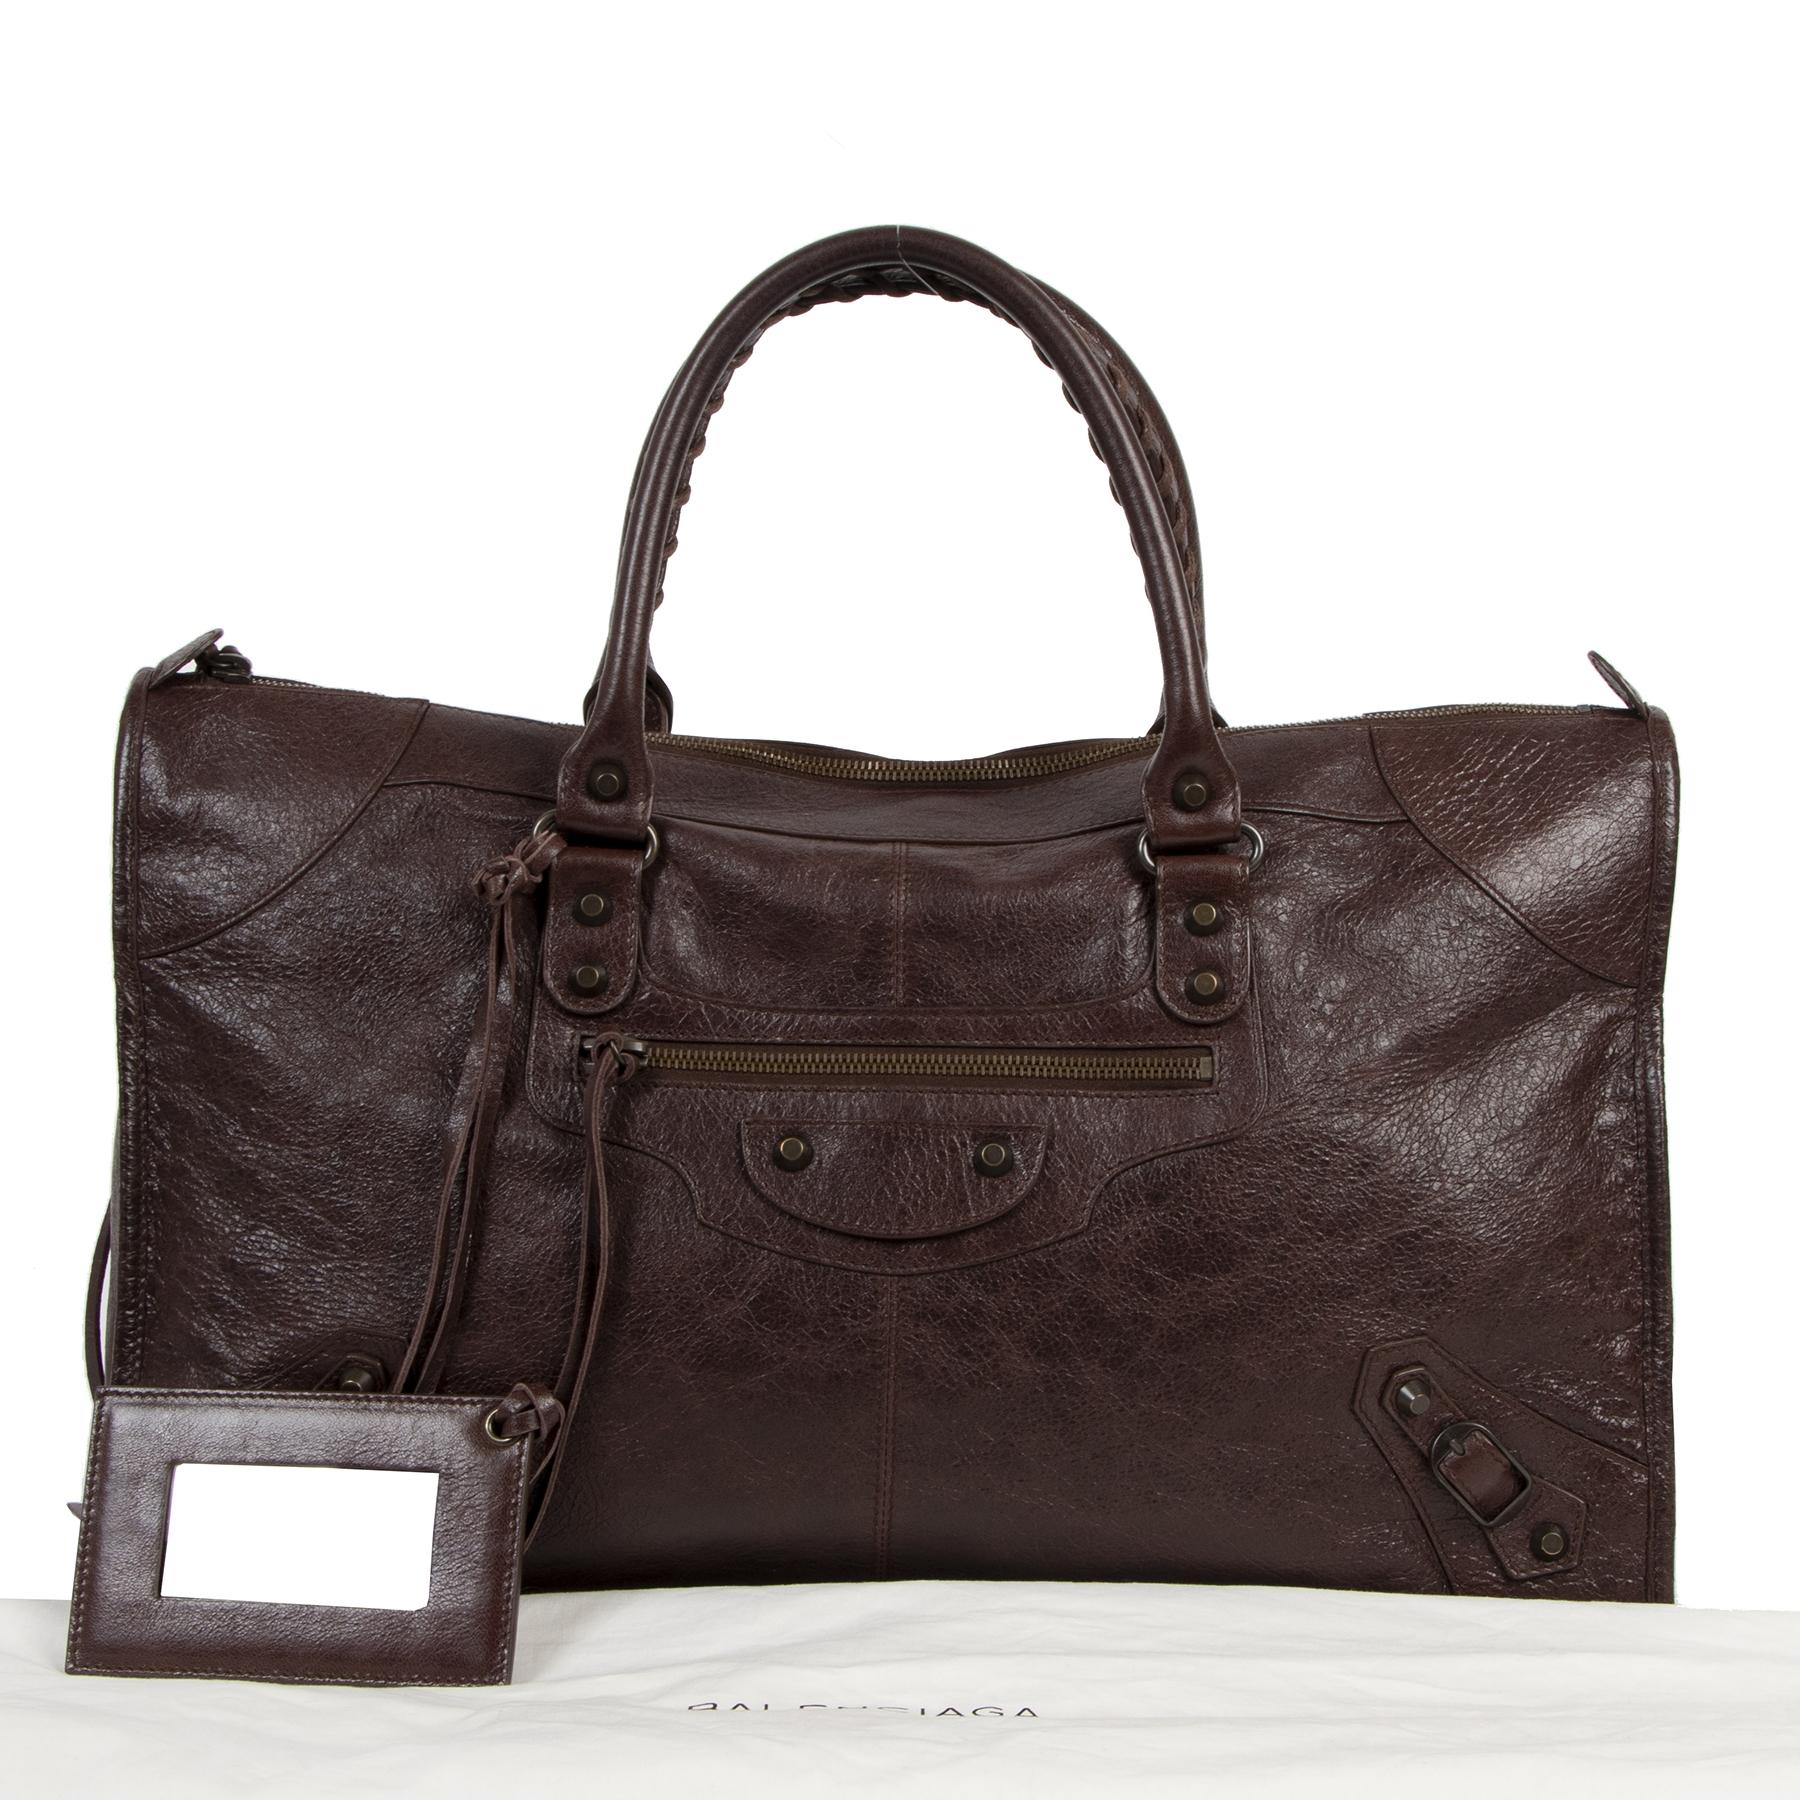 Balenciaga Burgundy Leather Work Bag